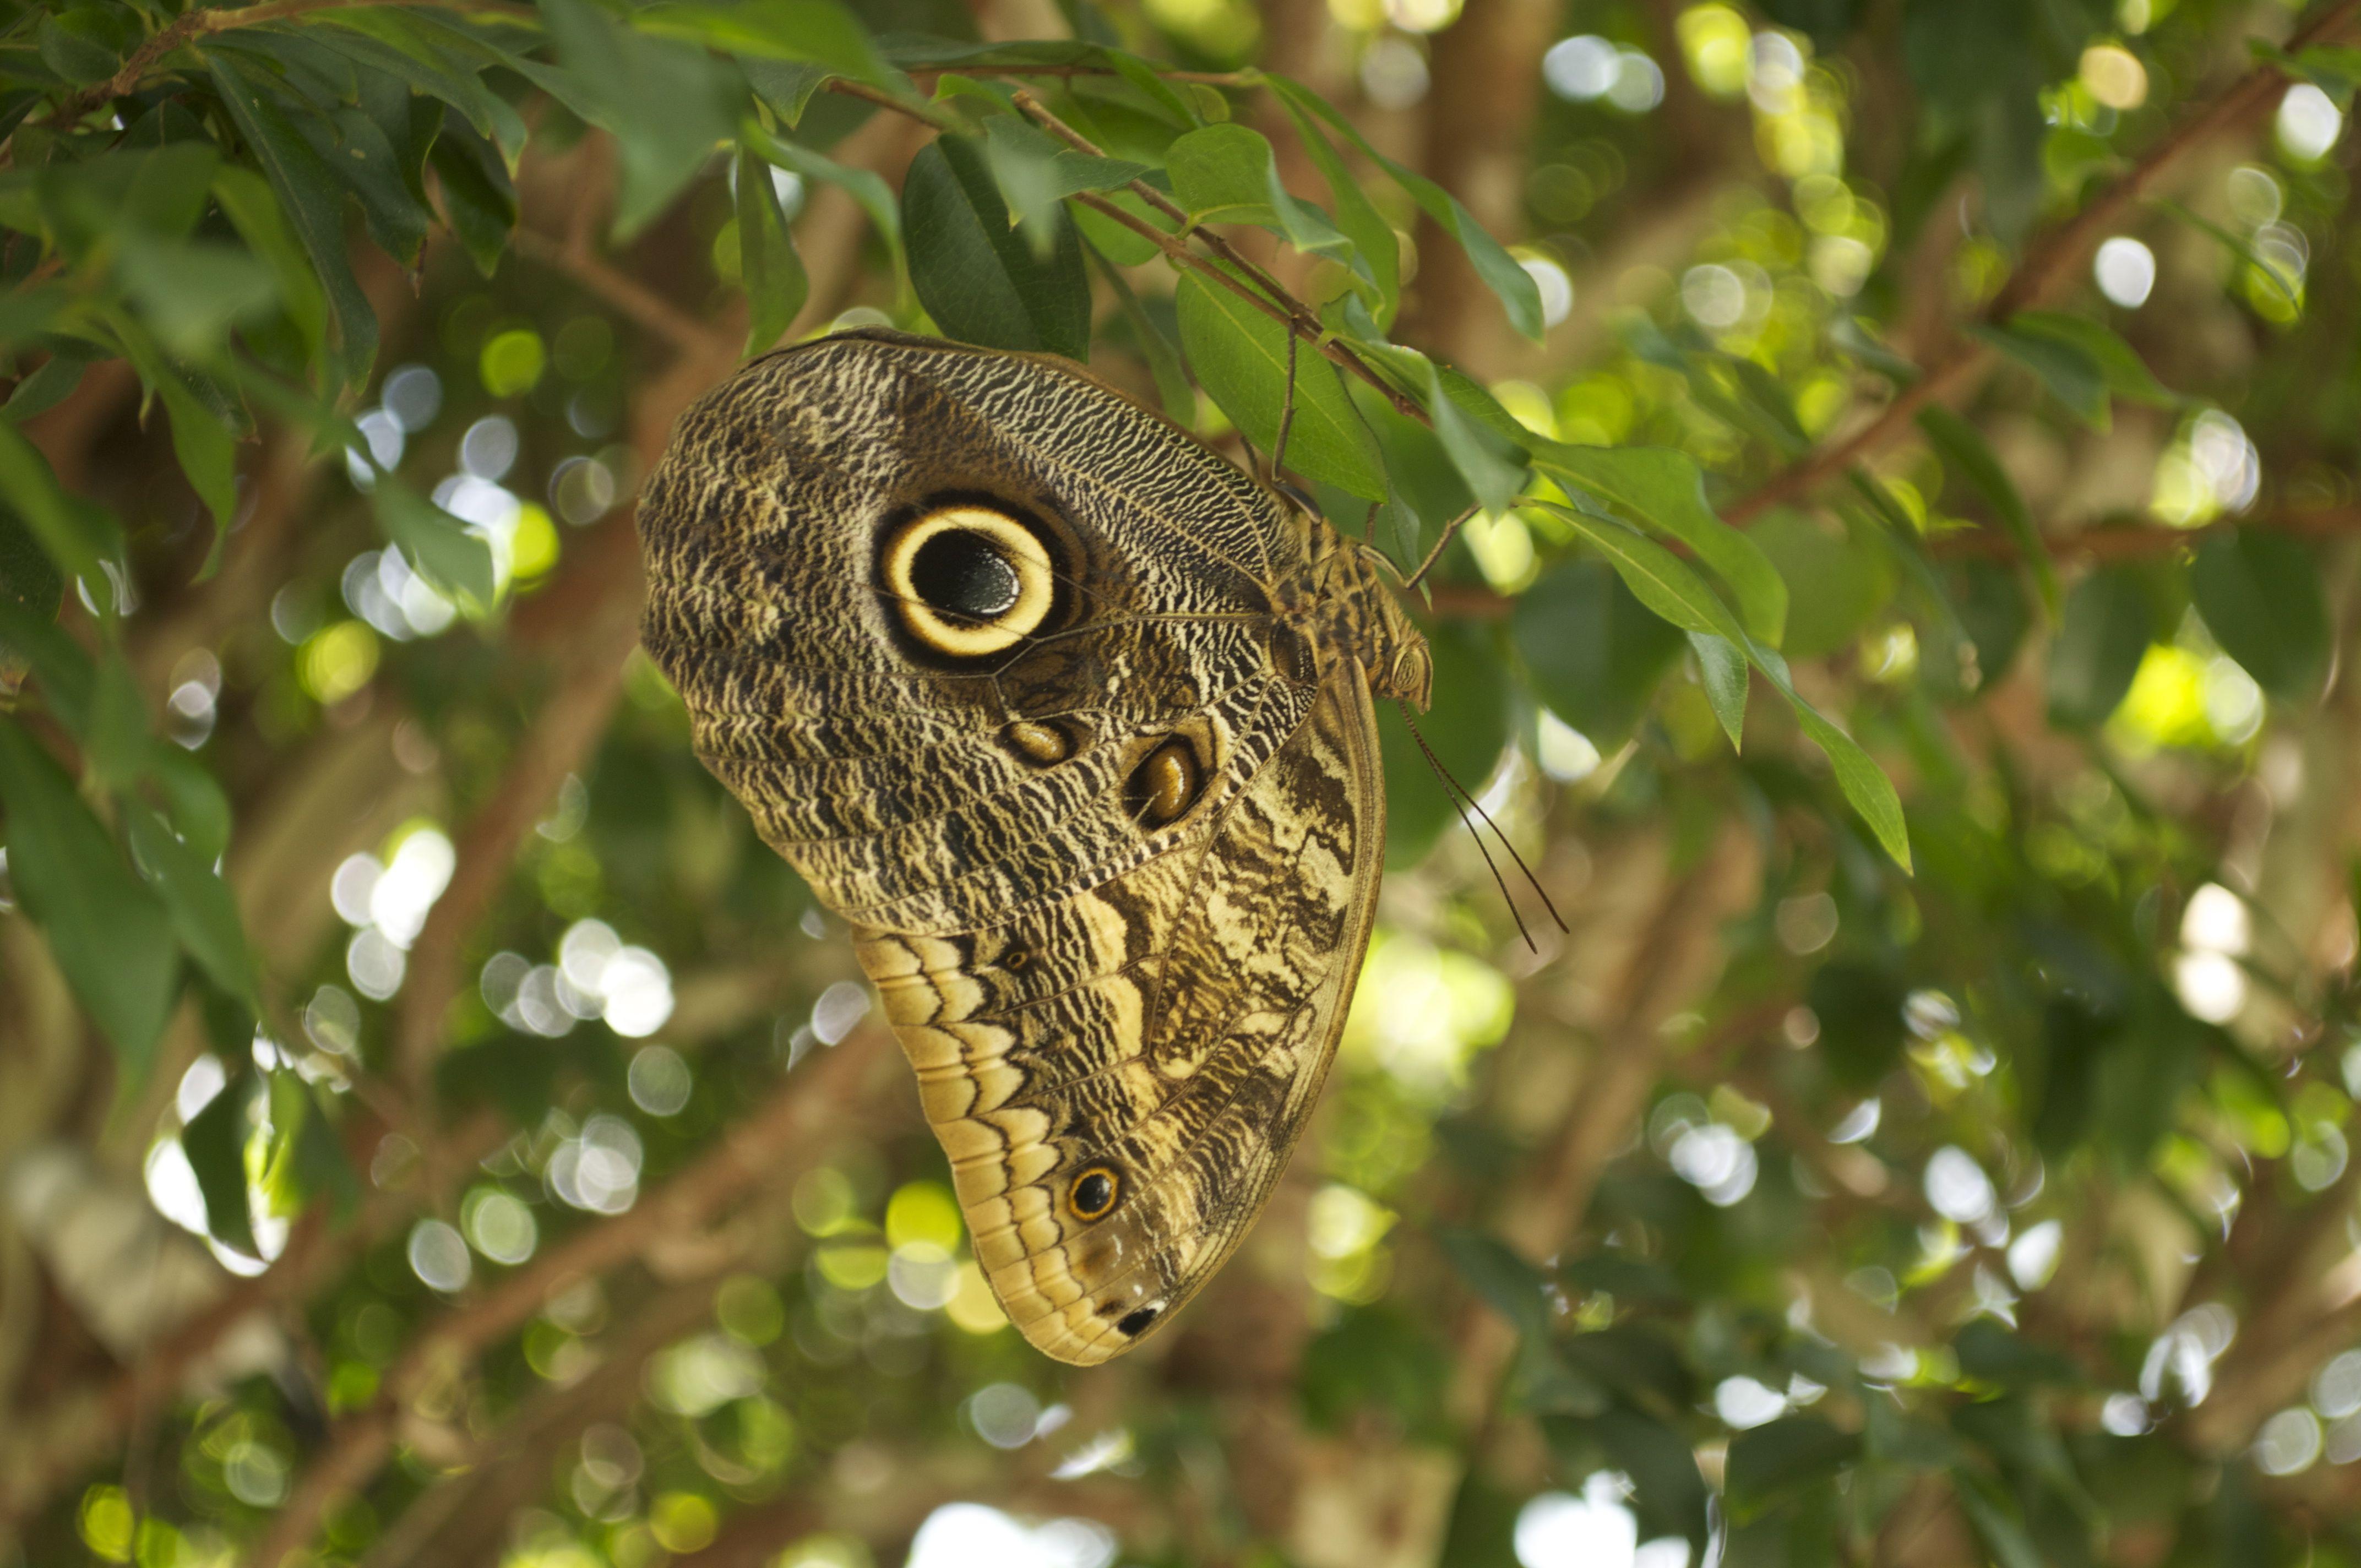 Butterfly World, Pompano Beach, FL | Our Honeymoon: Pompano Beach ...